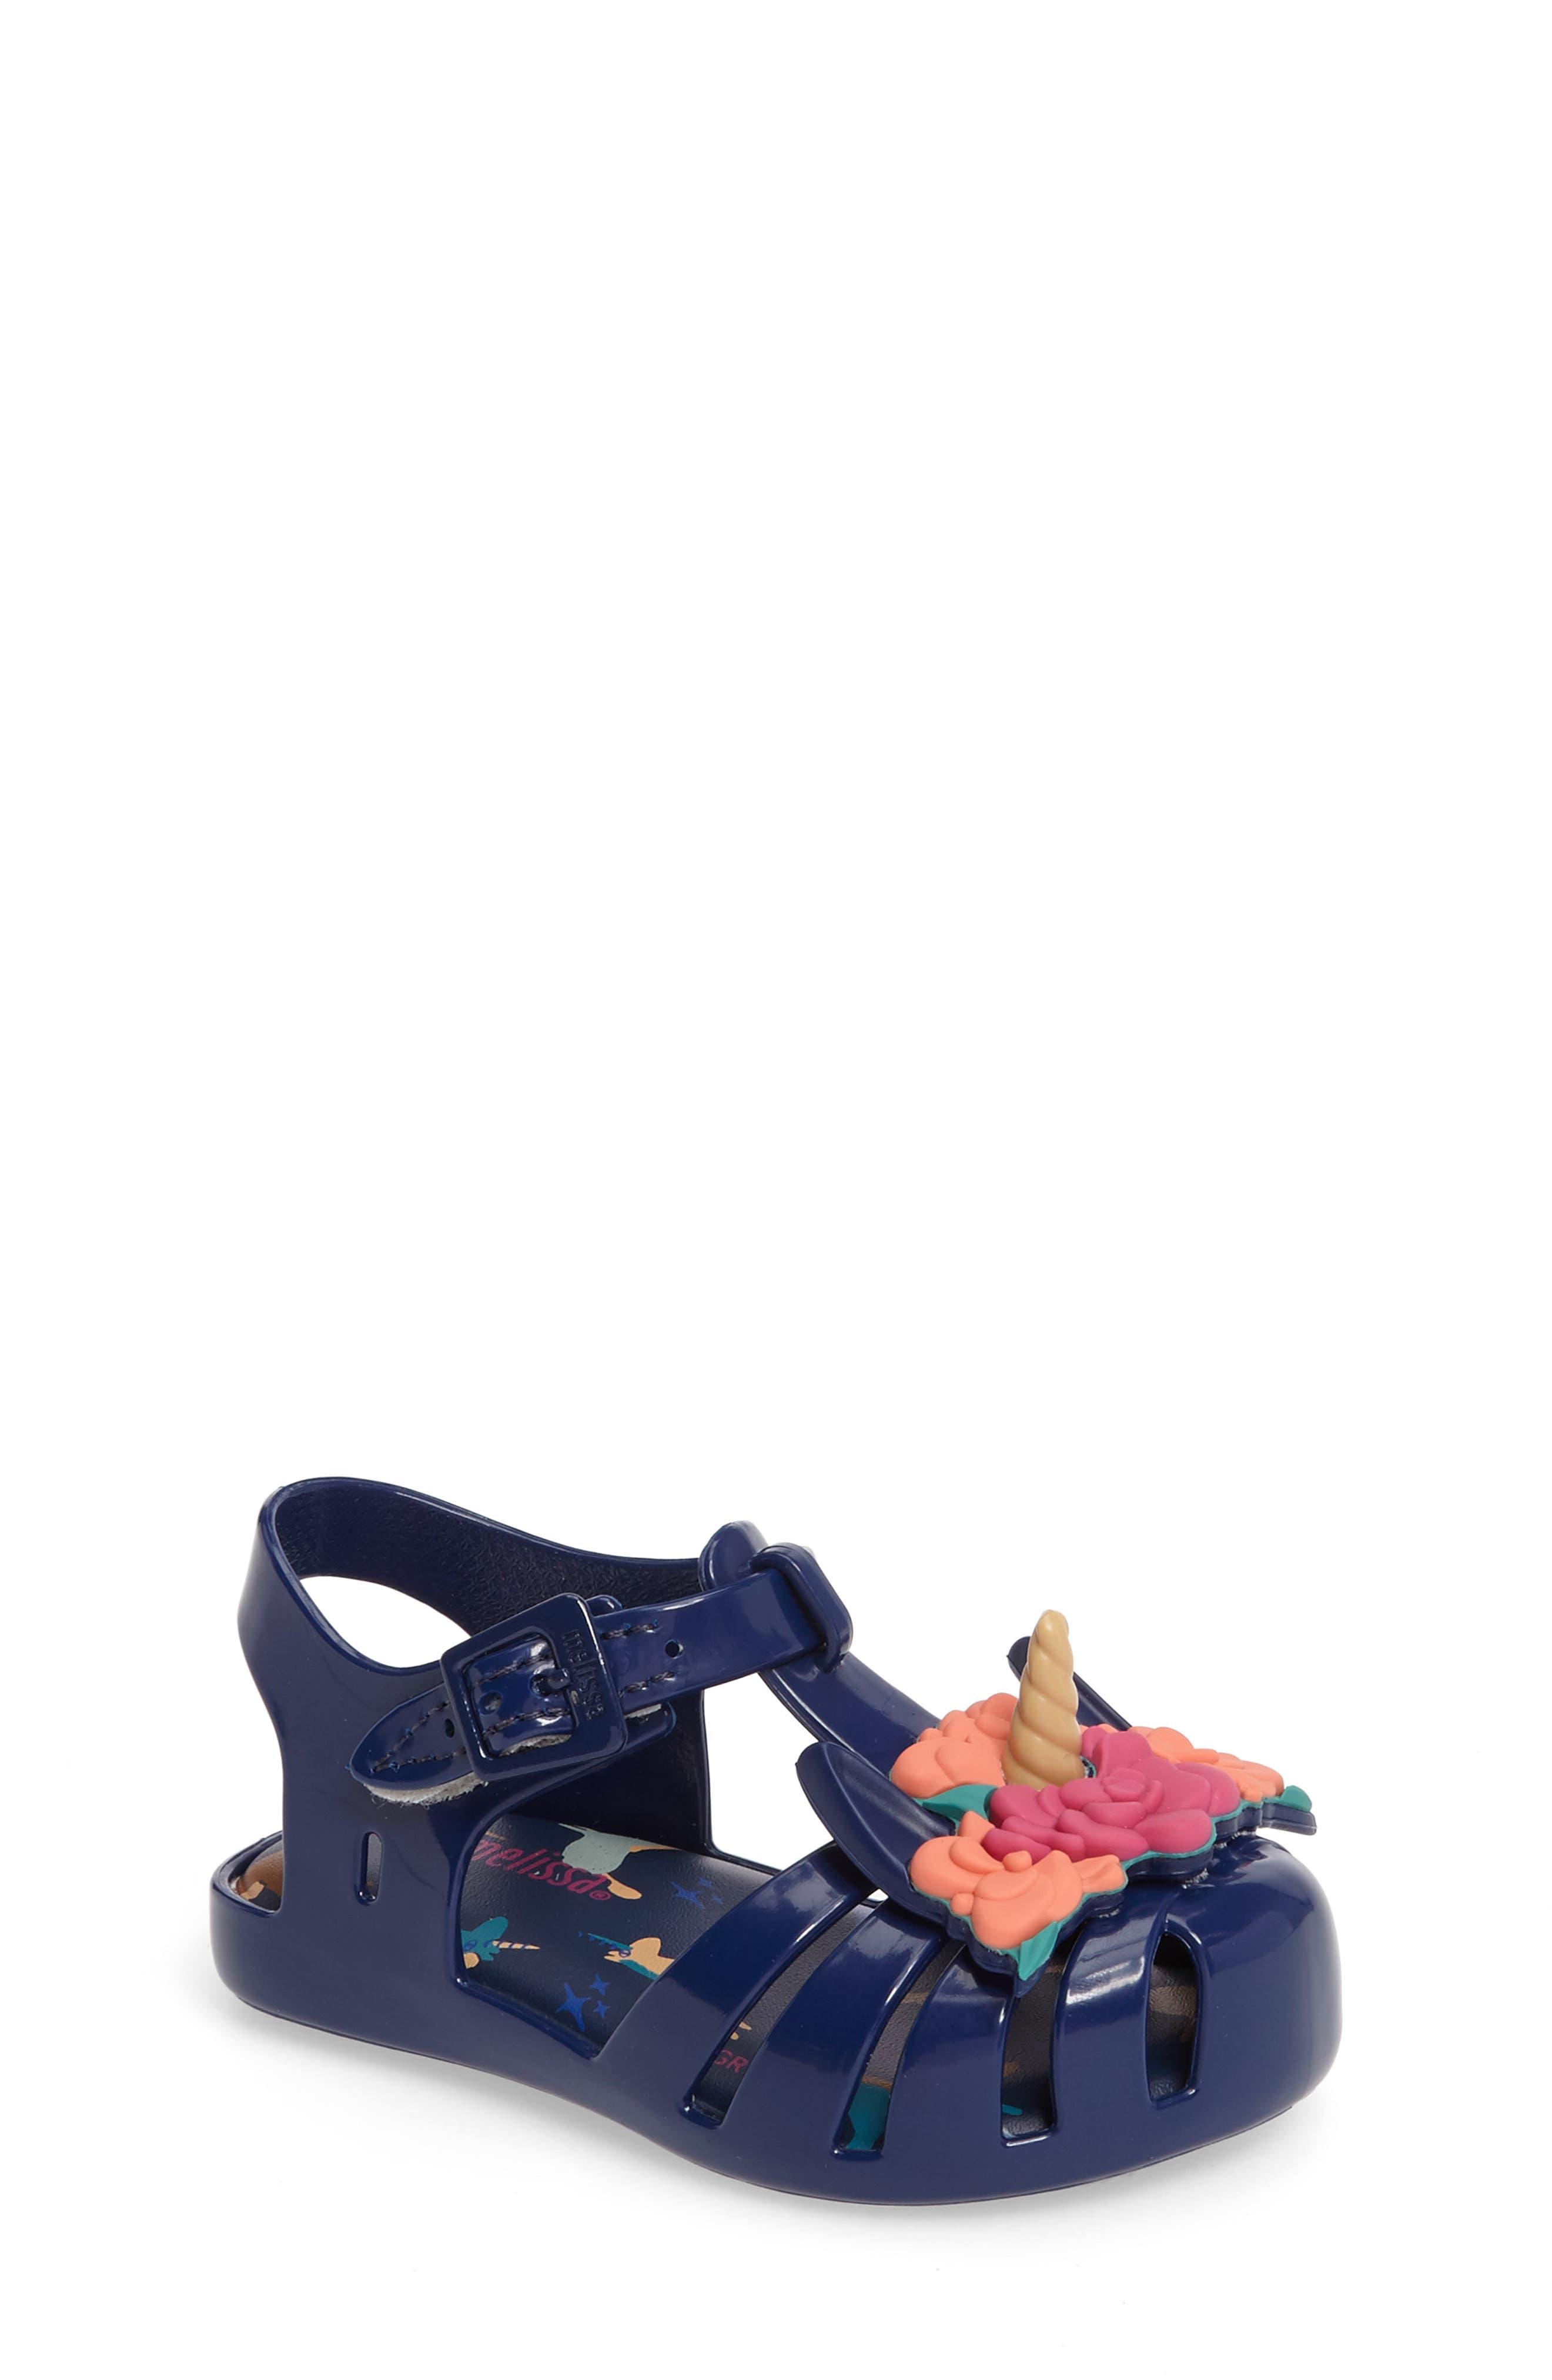 Alternate Image 1 Selected - Mini Melissa Aranha Fabula Unicorn Sandal (Walker & Toddler)